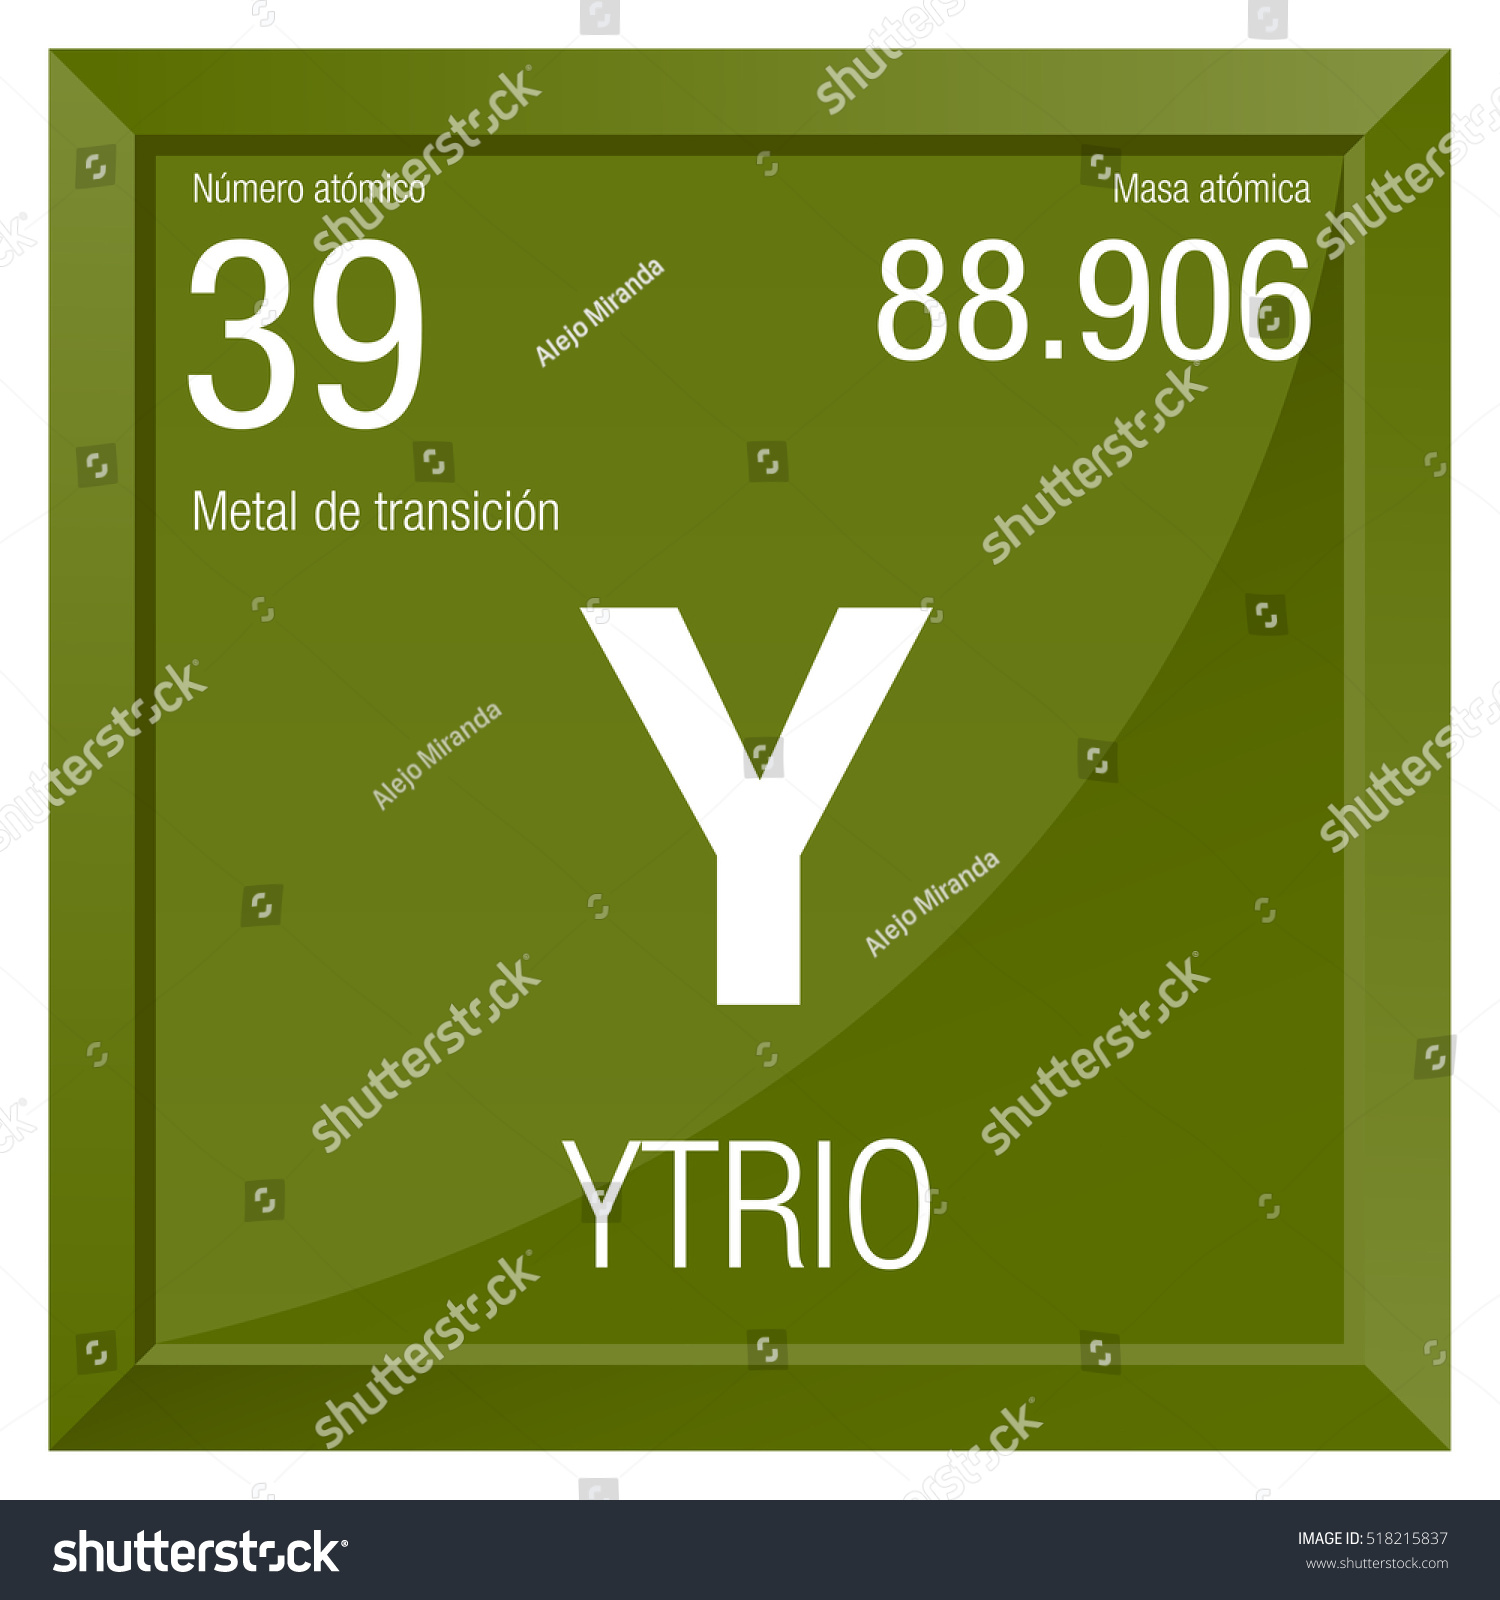 Y periodic table image collections periodic table images ytrio symbol yttrium spanish language element stock vector ytrio symbol yttrium in spanish language element number gamestrikefo Choice Image